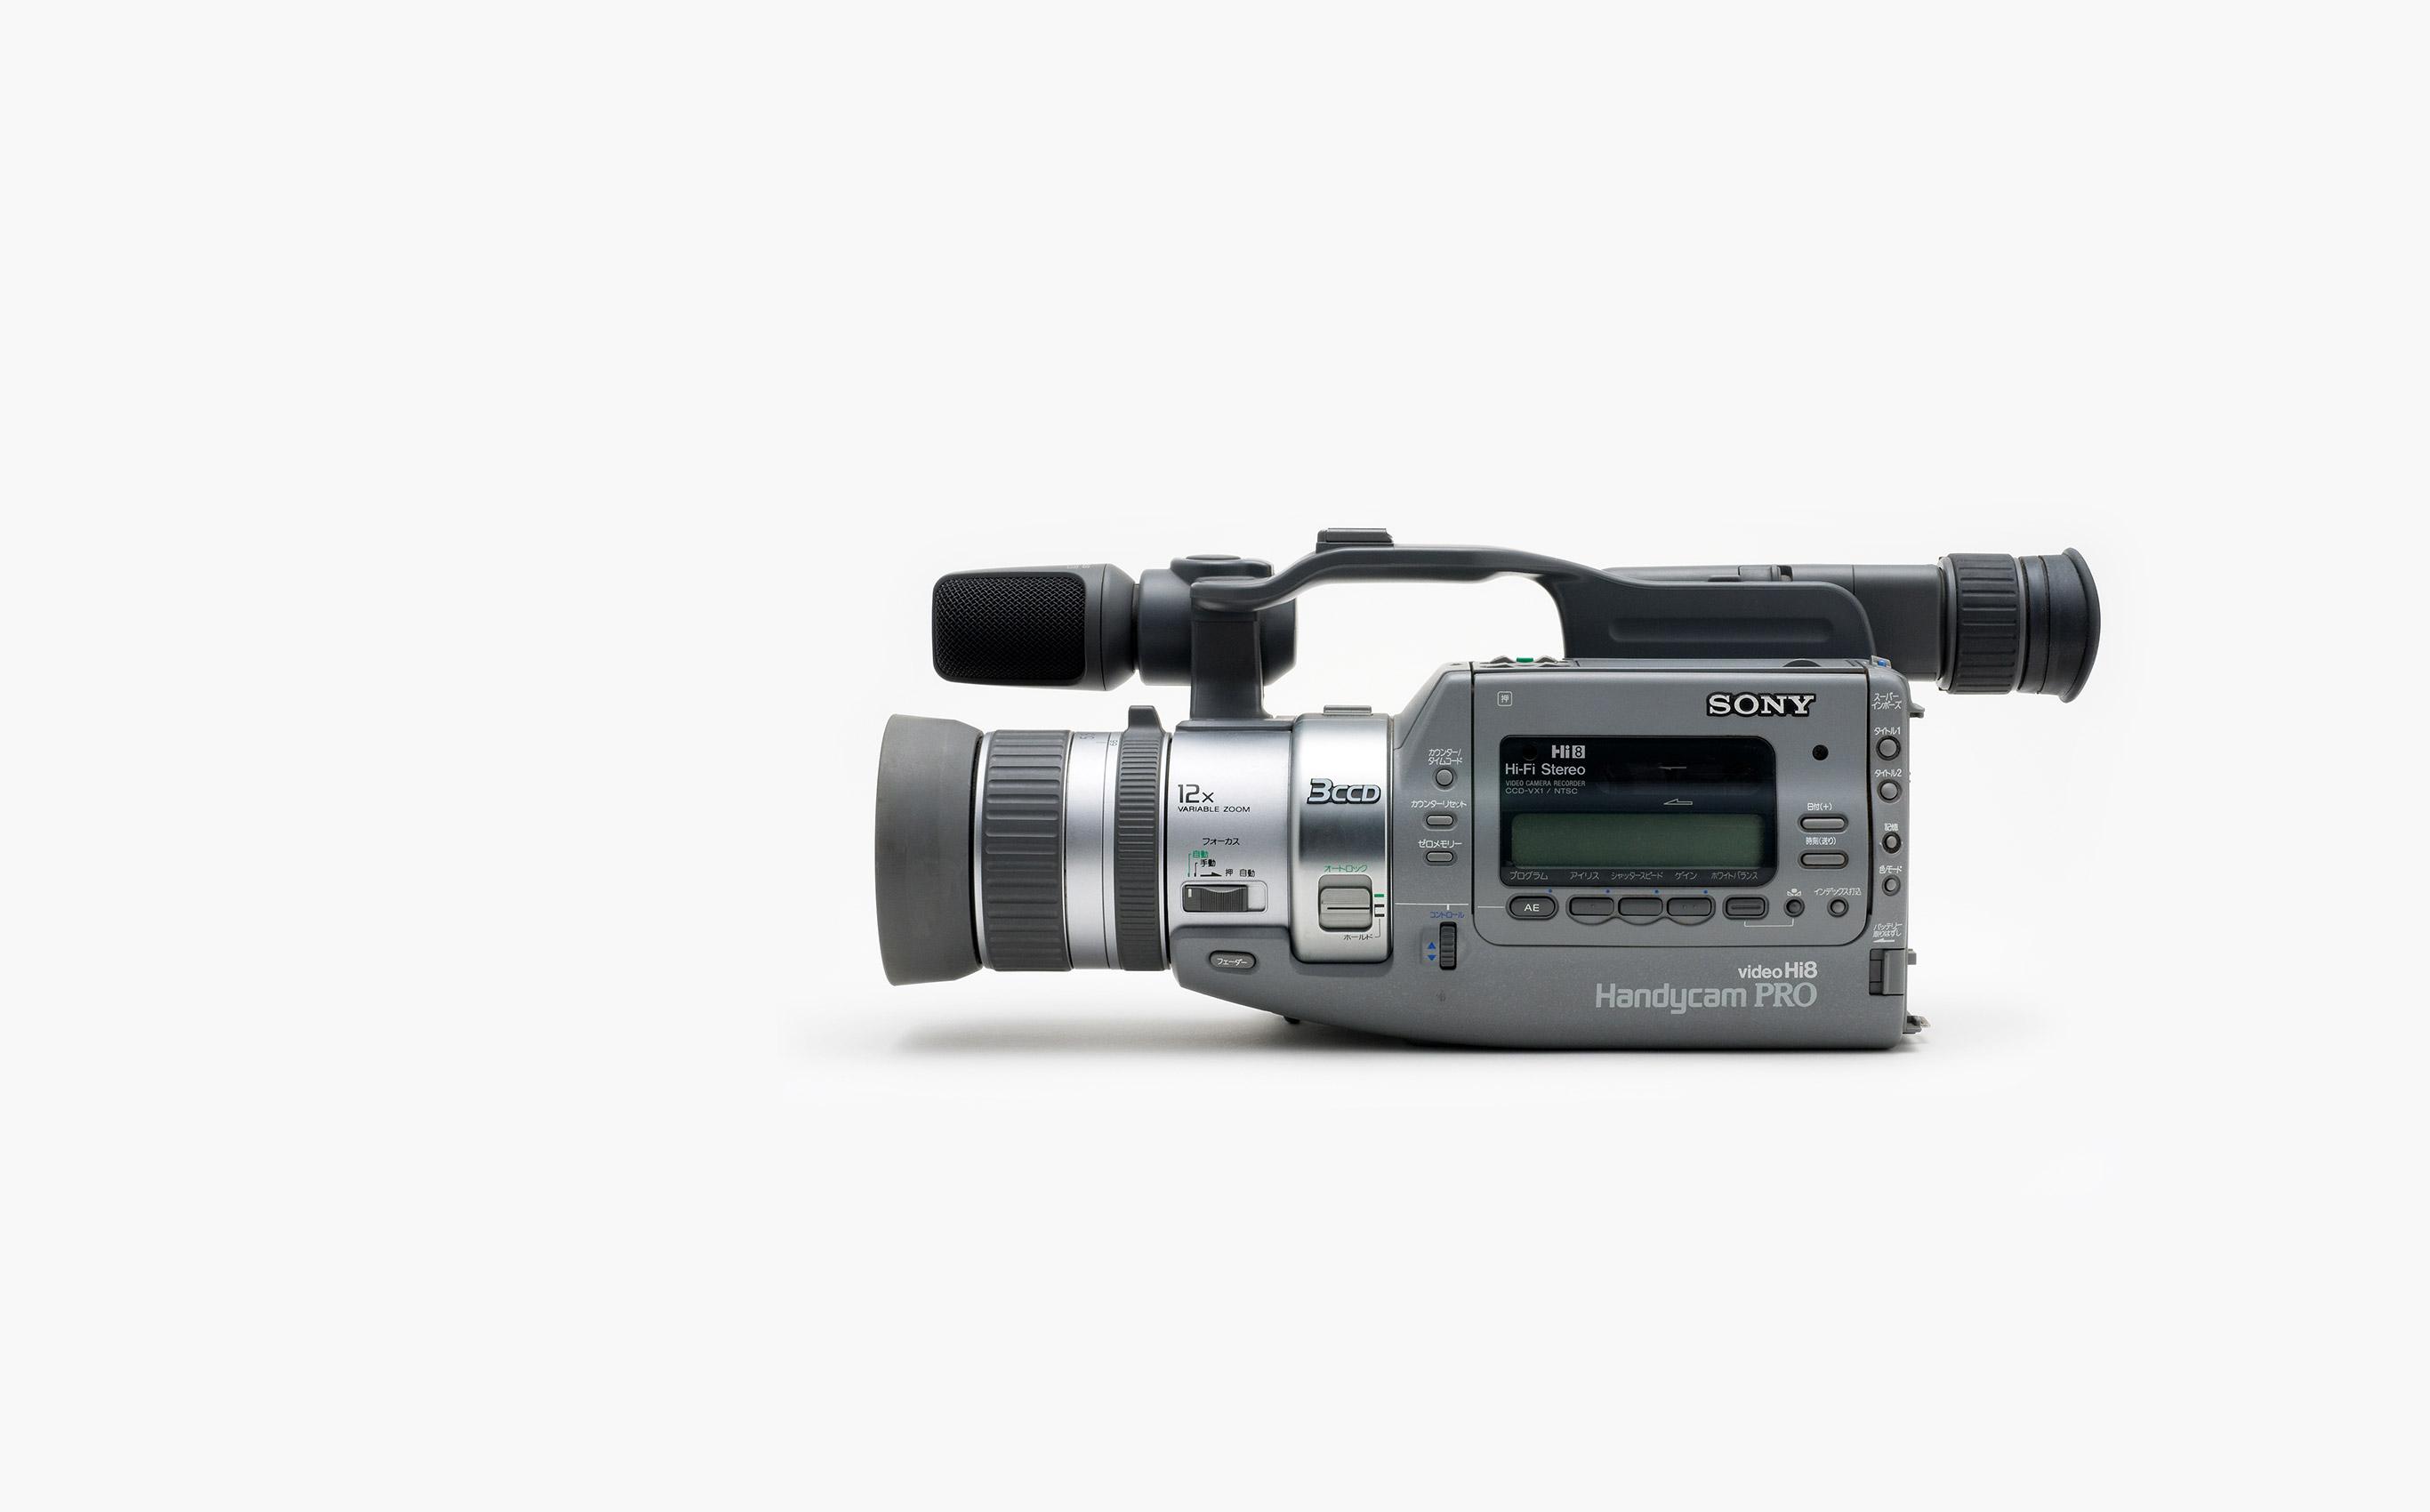 Handycam PRO VX-1